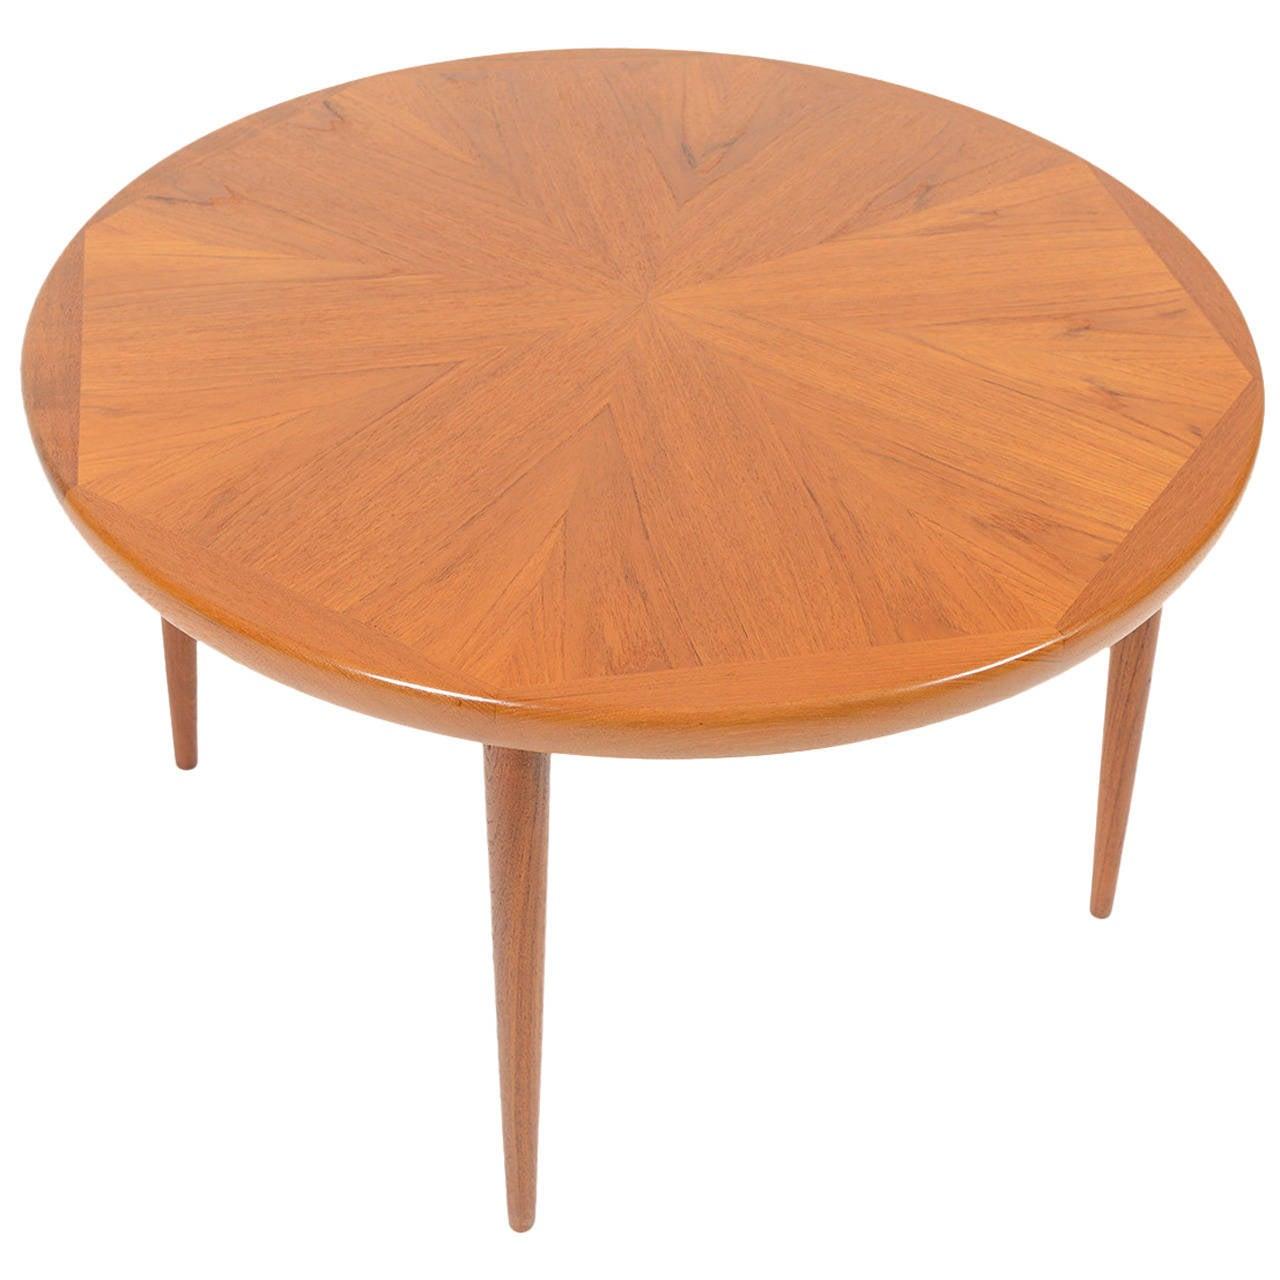 Starburst Round Coffee Table In Teak By Spottrup M Belfabrik For Sale At 1stdibs